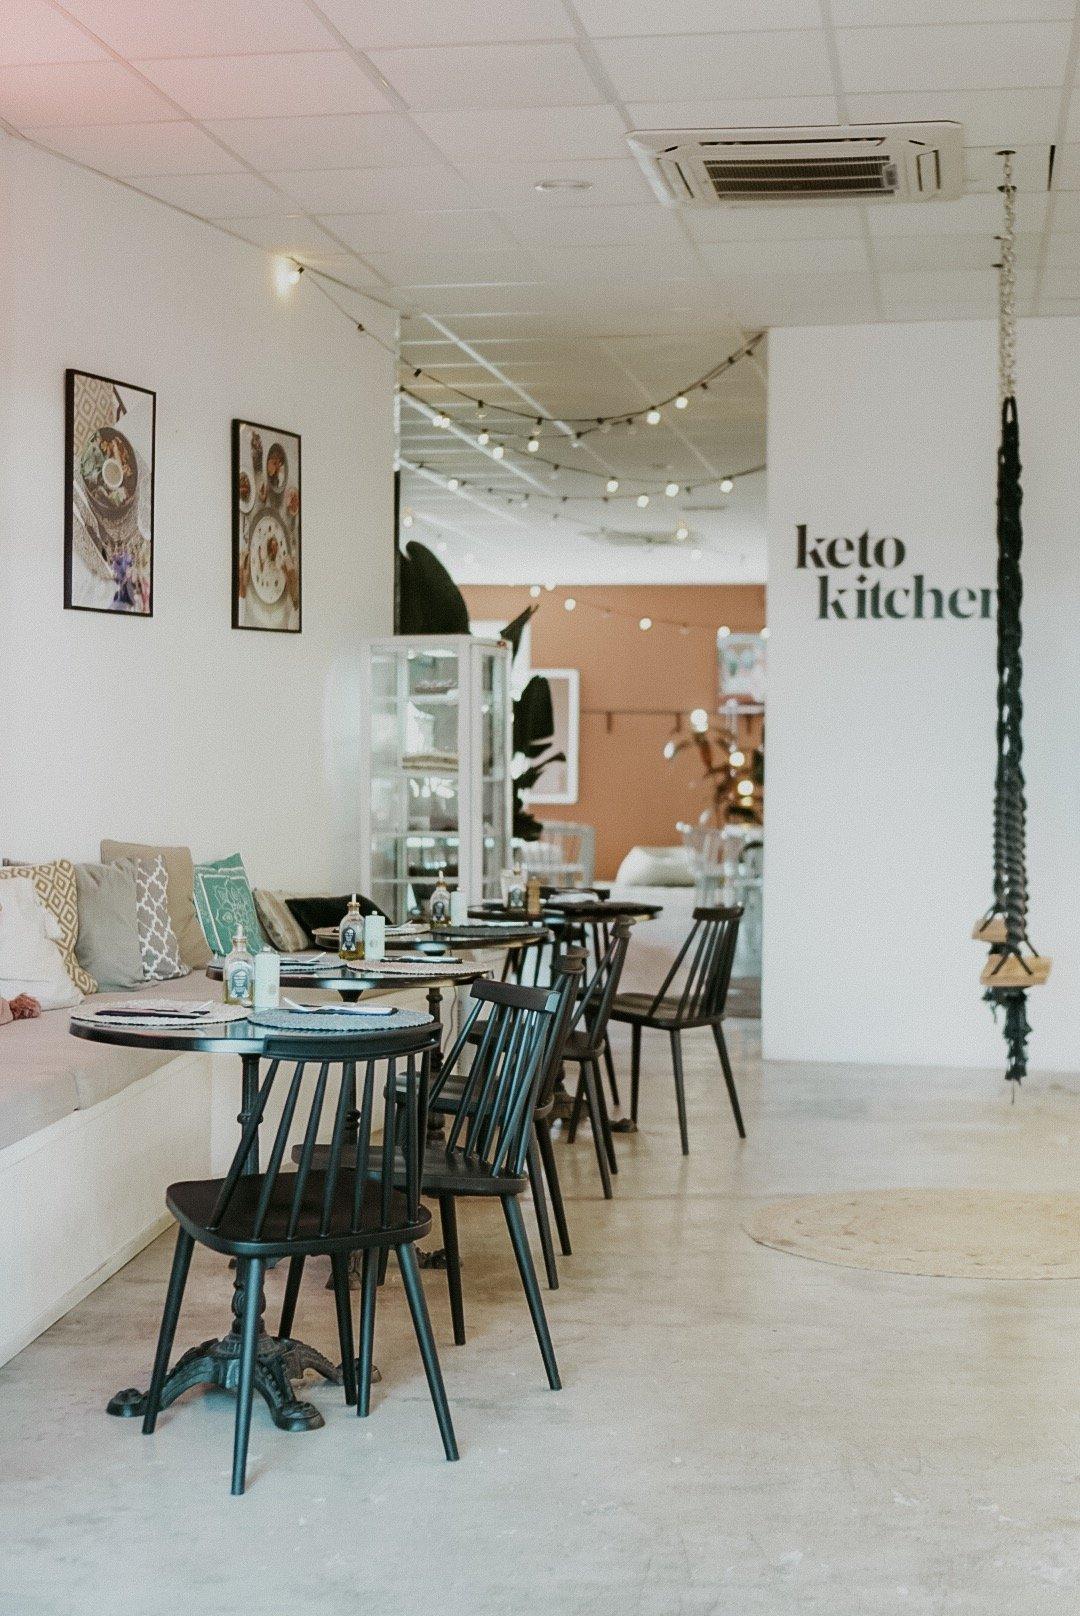 Keto Kitchen: nieuwkomer op Ibiza